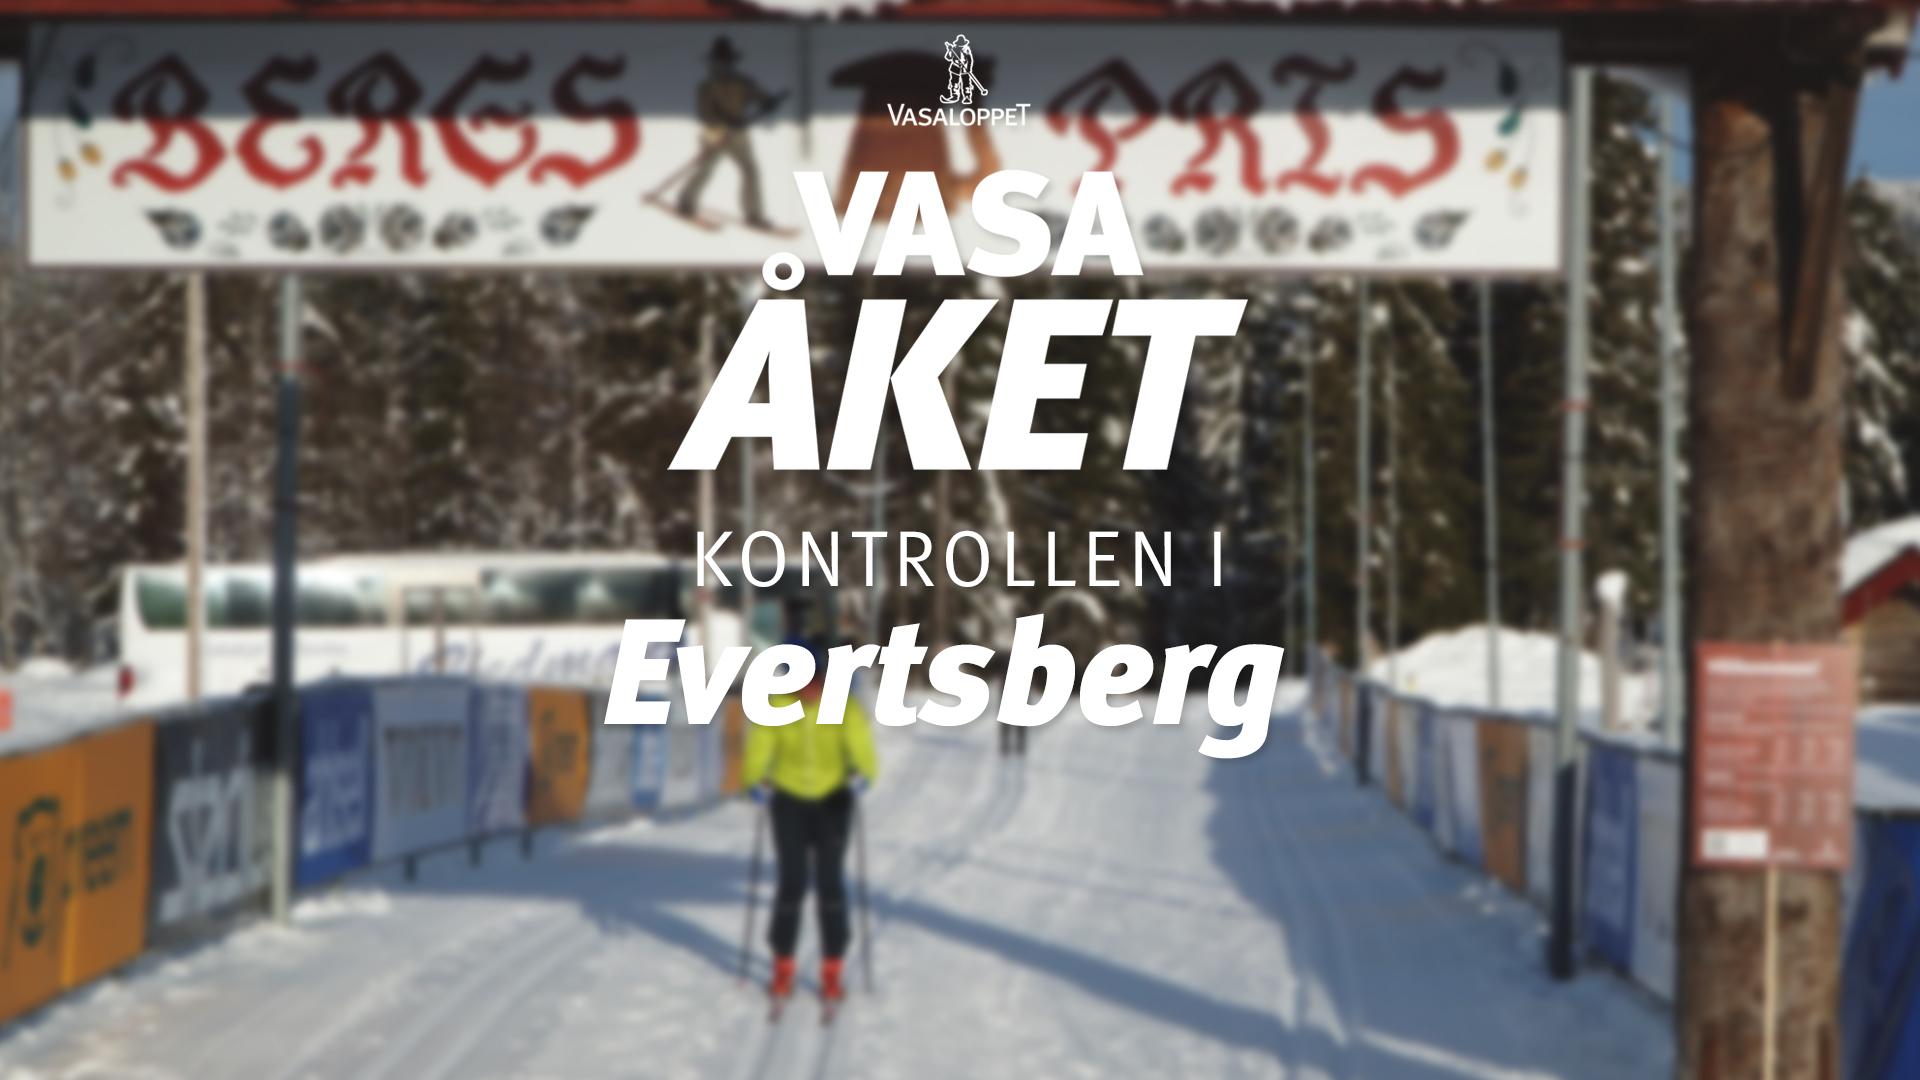 5 mars, 2021 – Evertsberg